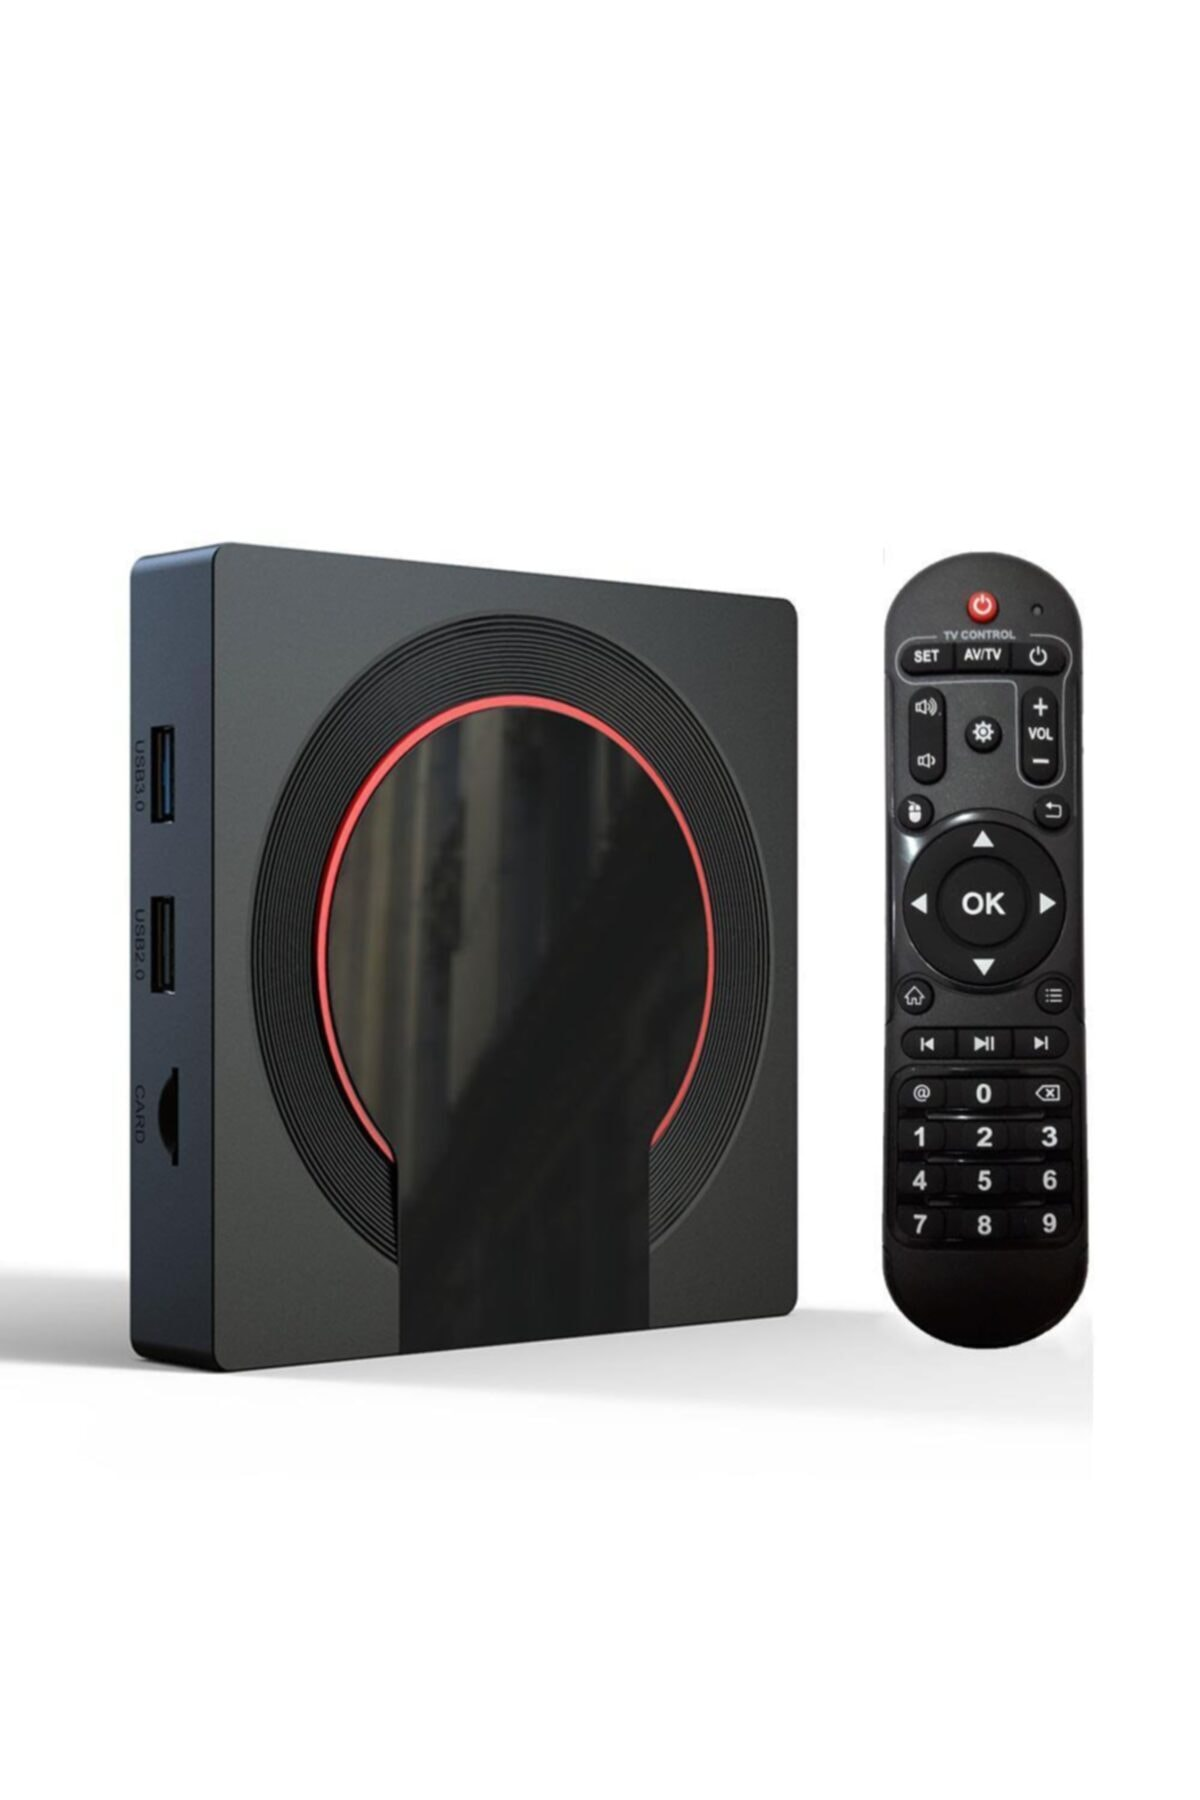 I96 Prime Amlogic S905x3 4gb 64gb Android Tv Box